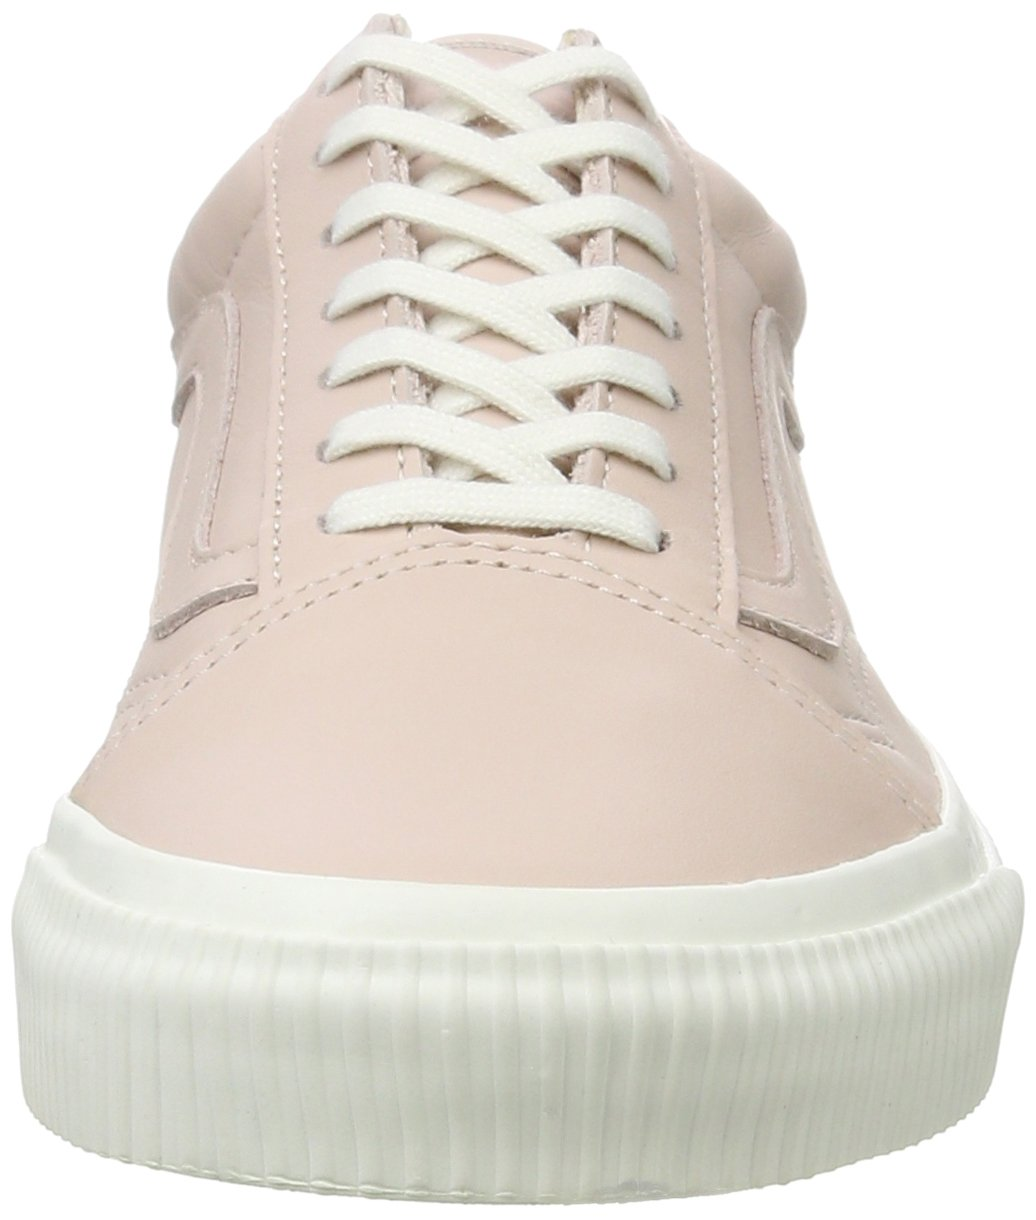 Vans Unisex Old Skool Classic Skate Shoes B01N7HIY08 6.5 M US Women / 5 M US Men|Sepia Rose/White